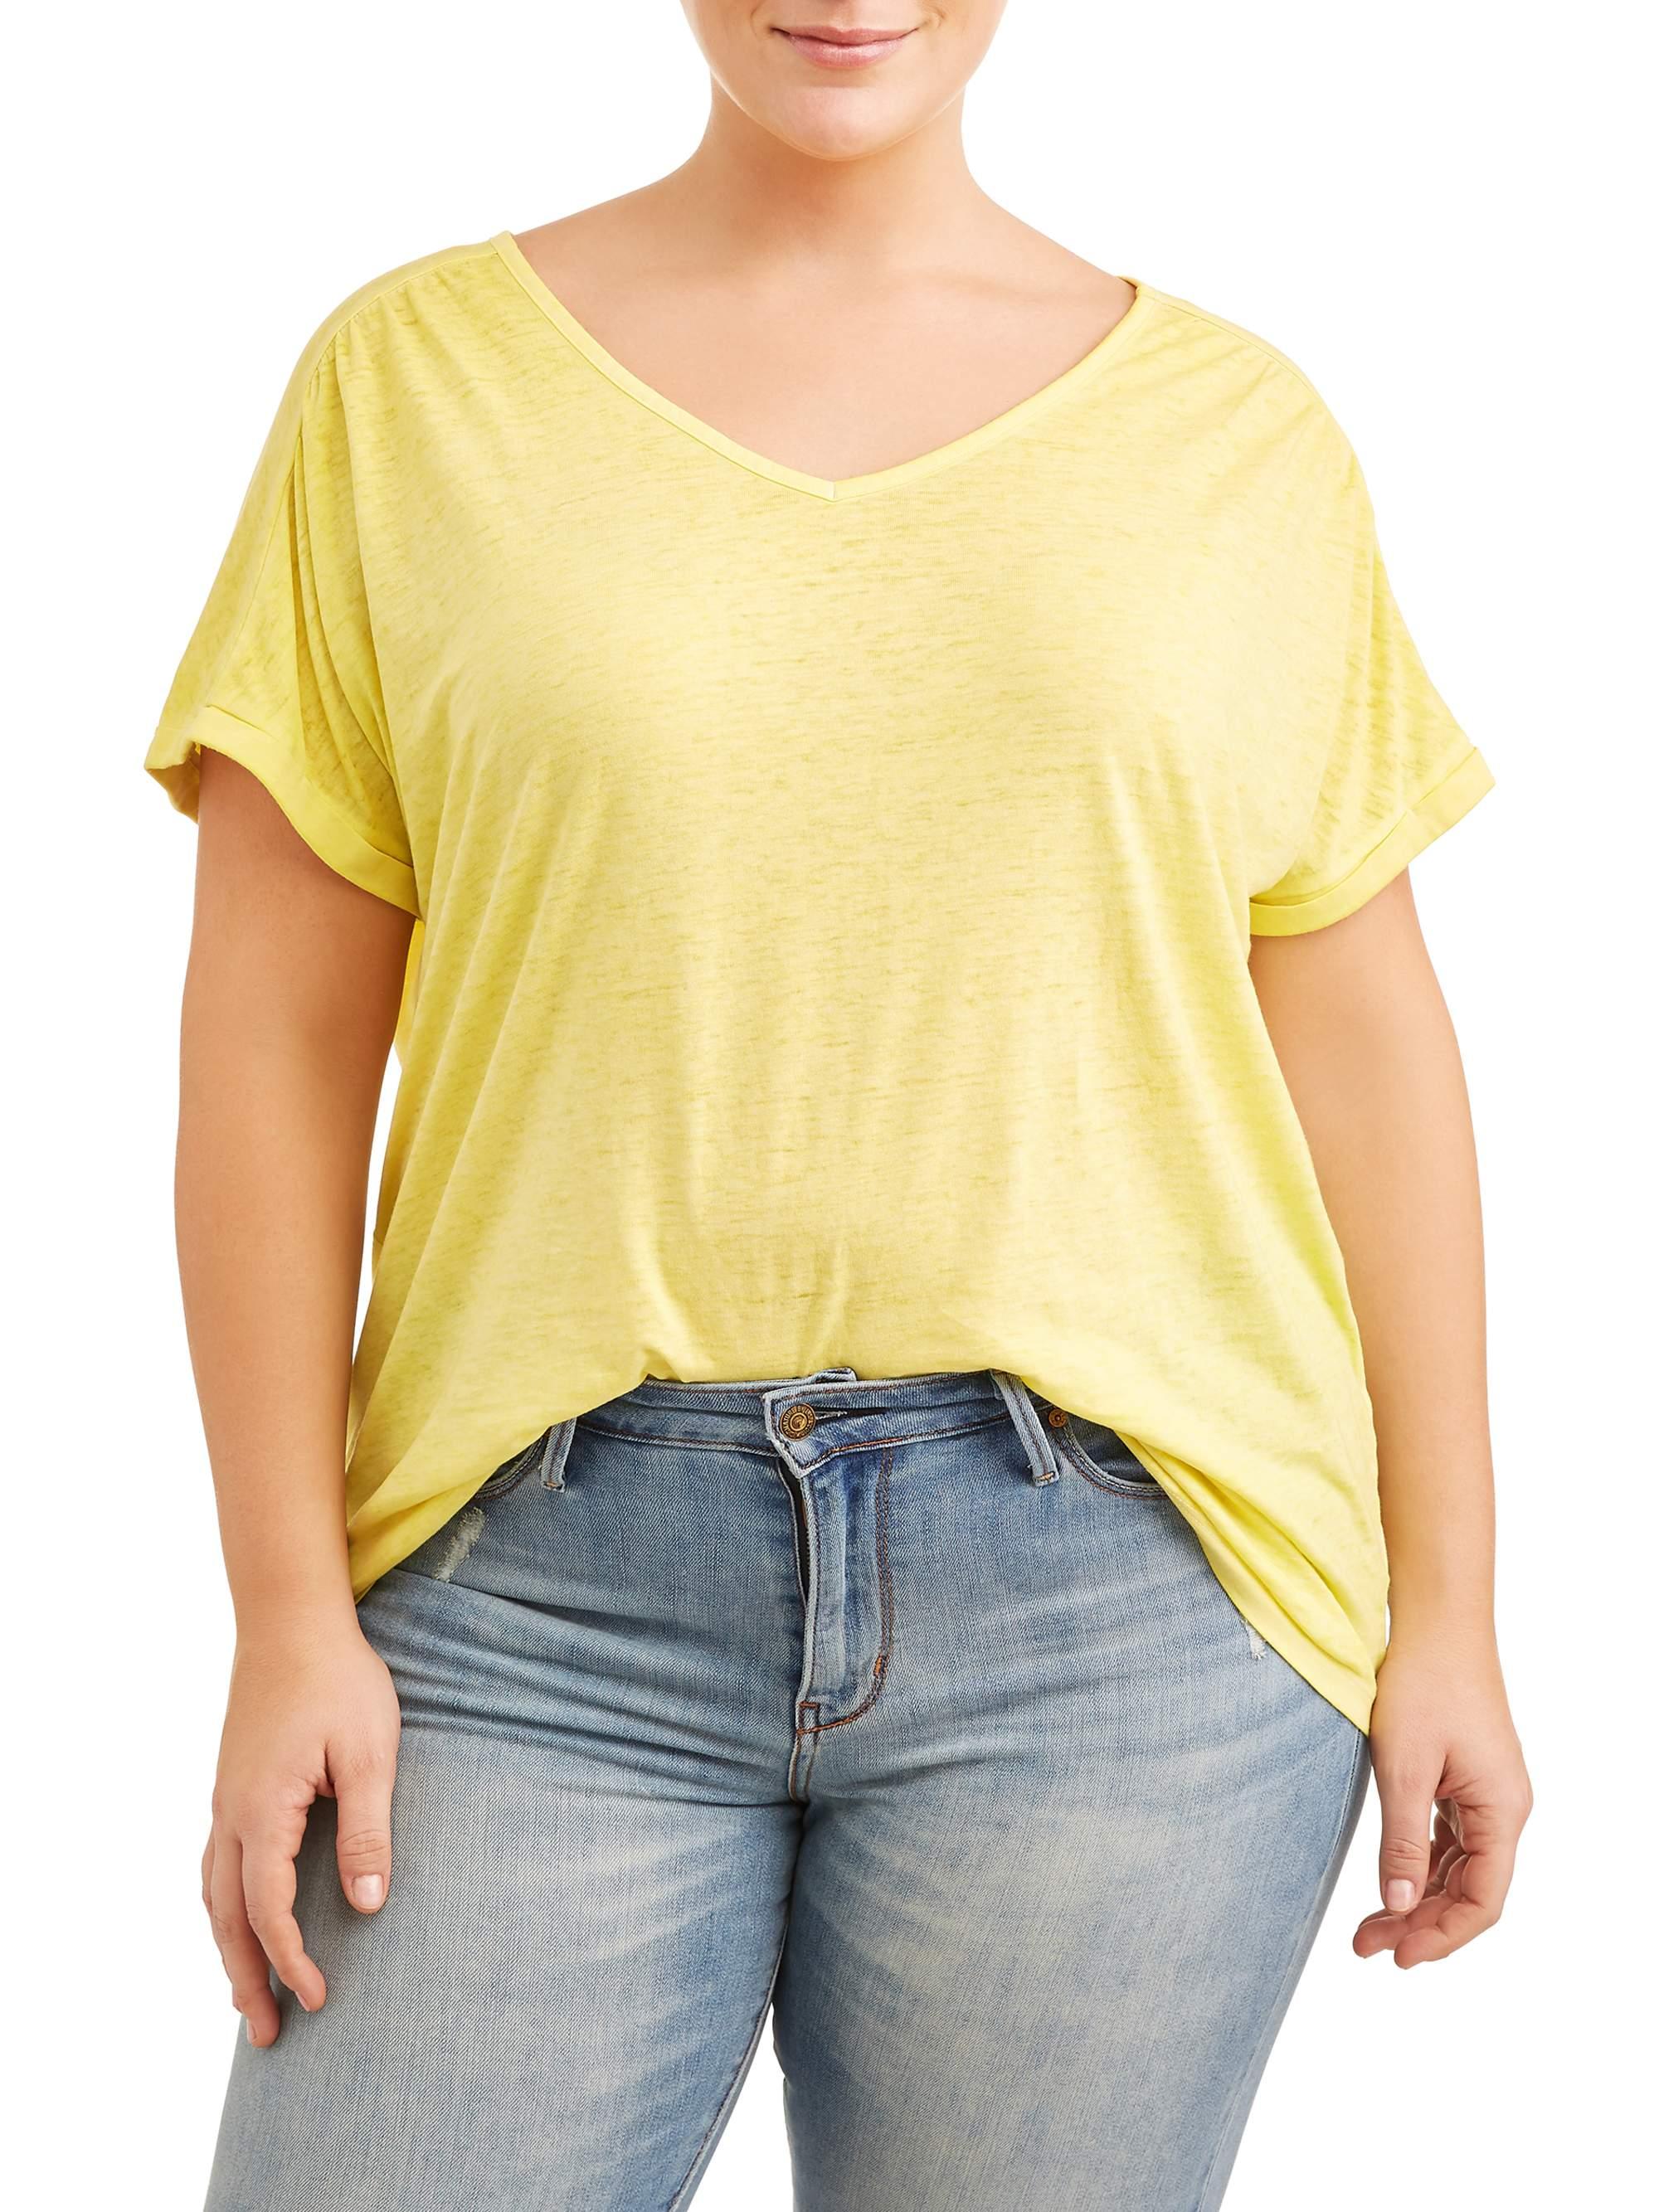 Women's Plus Size Cap Sleeve Tee